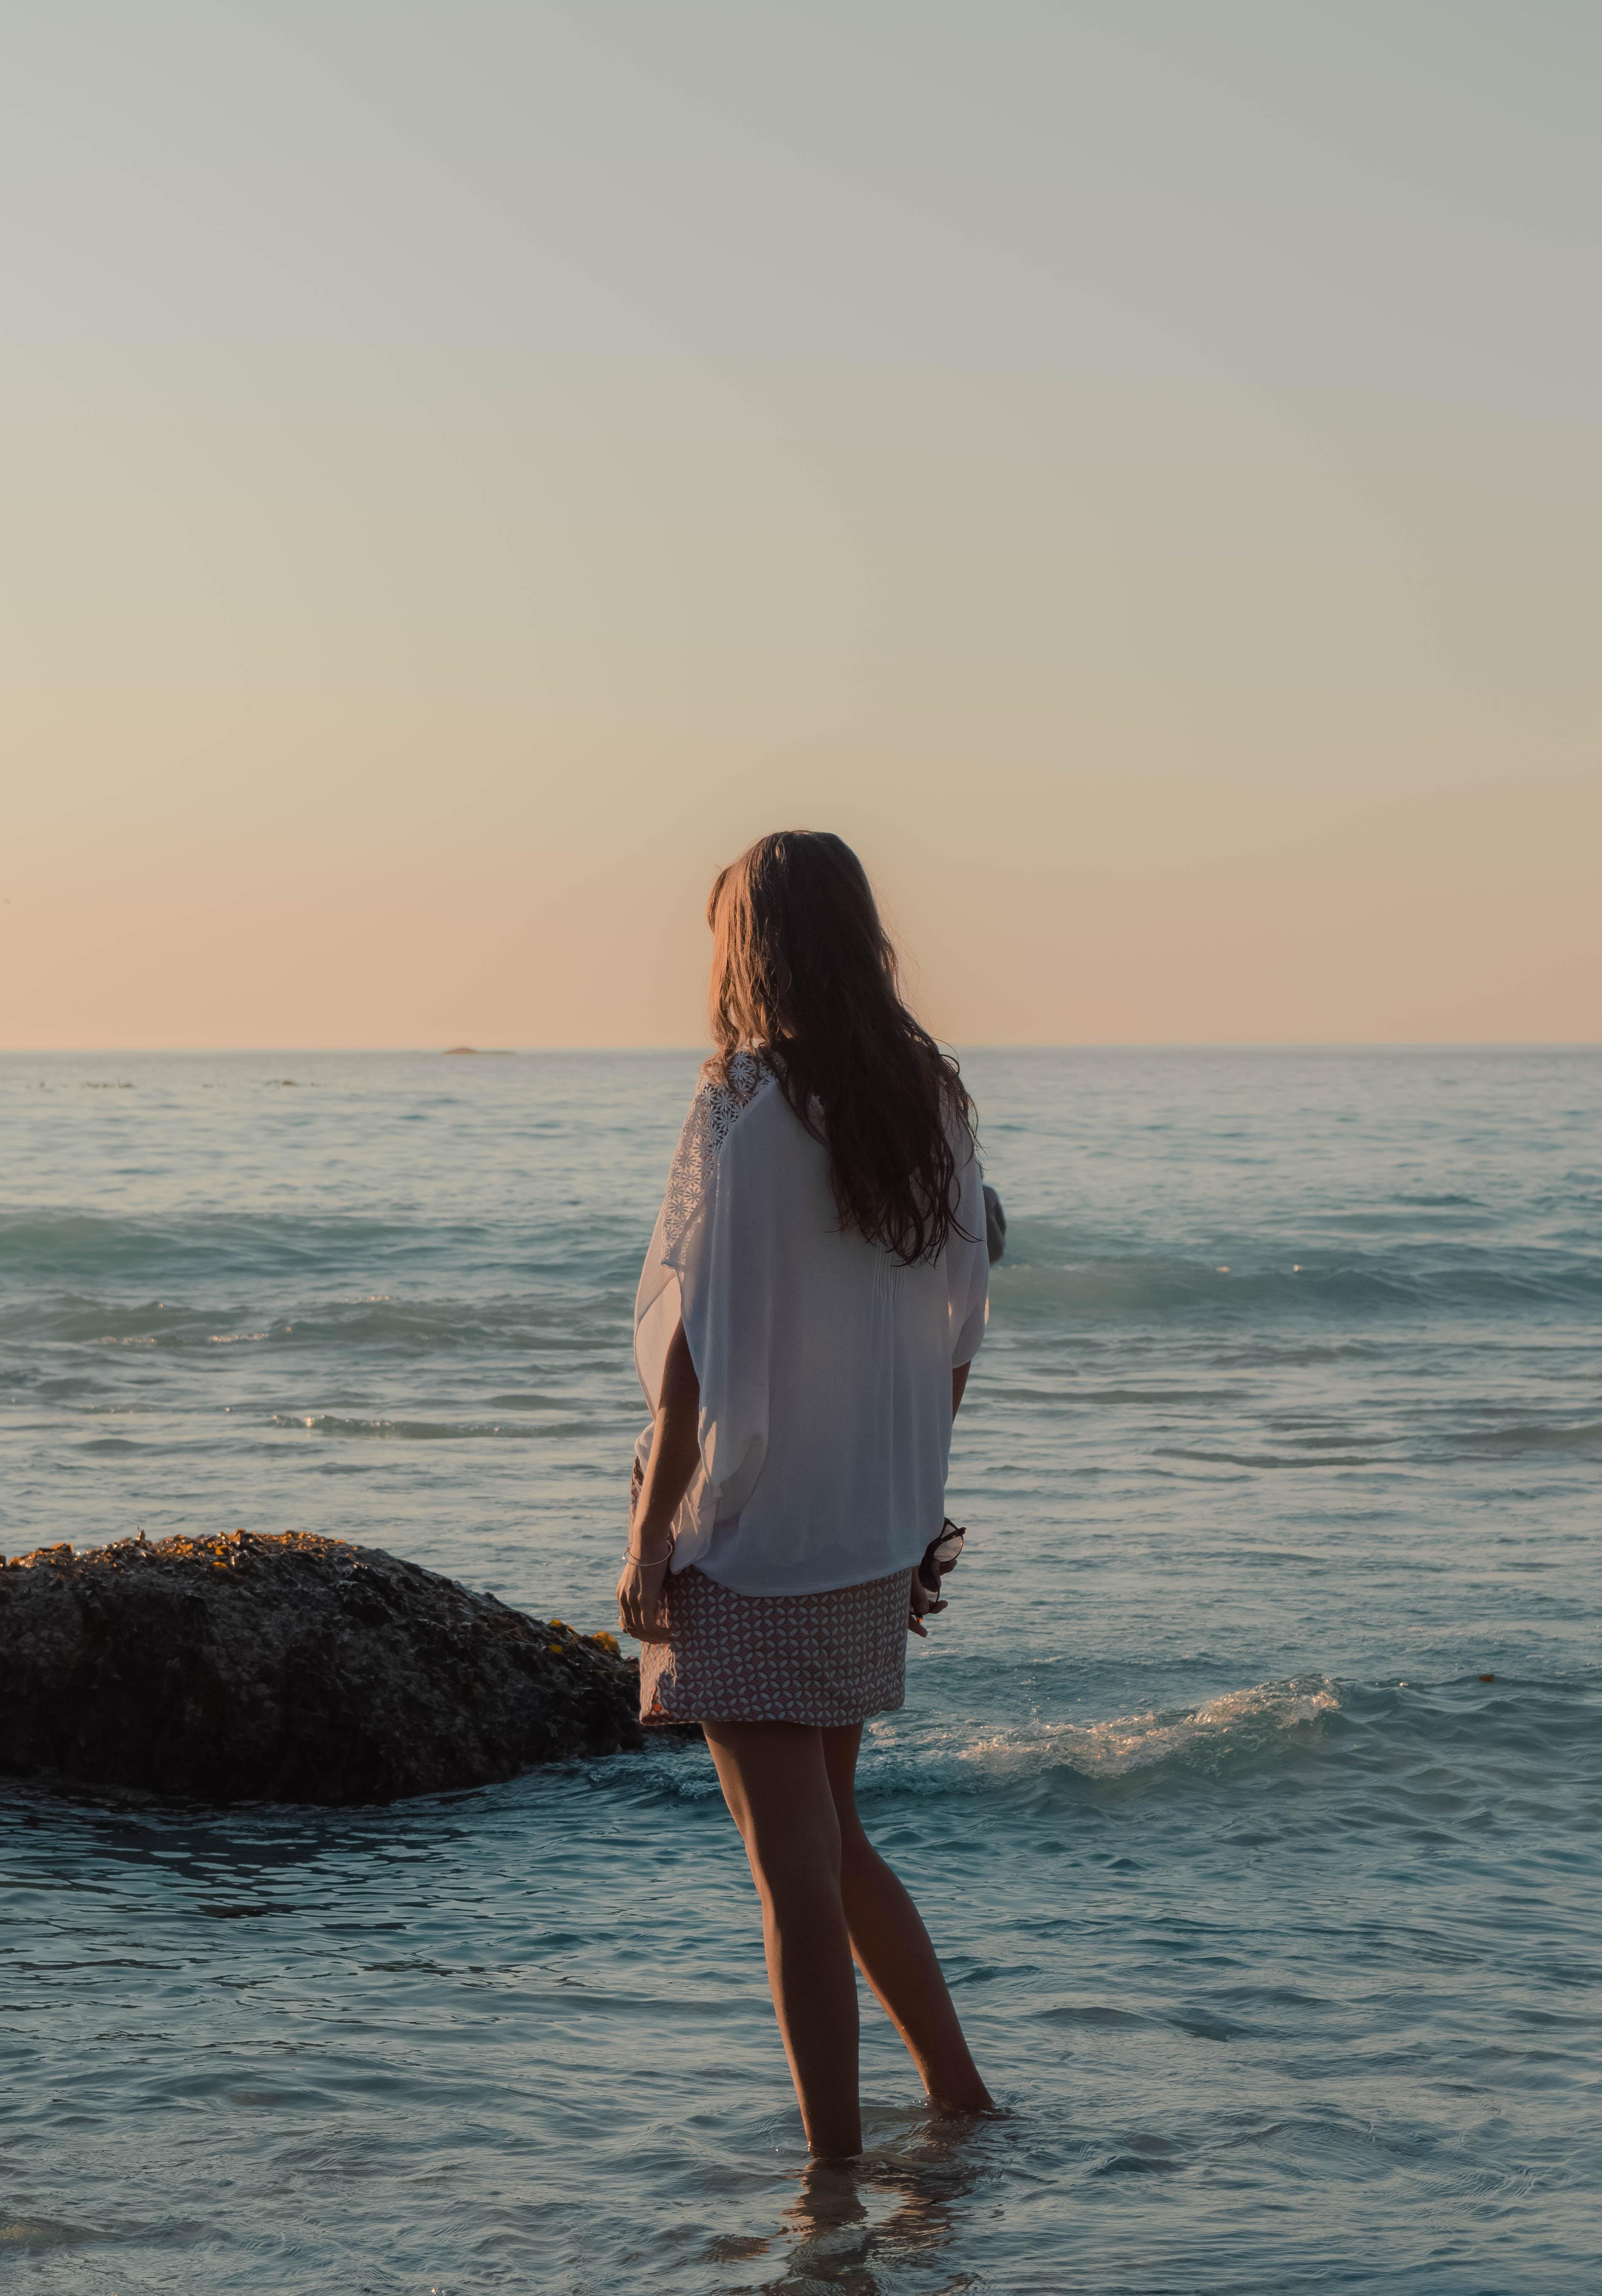 standing woman on water wearing white shirt during daytime